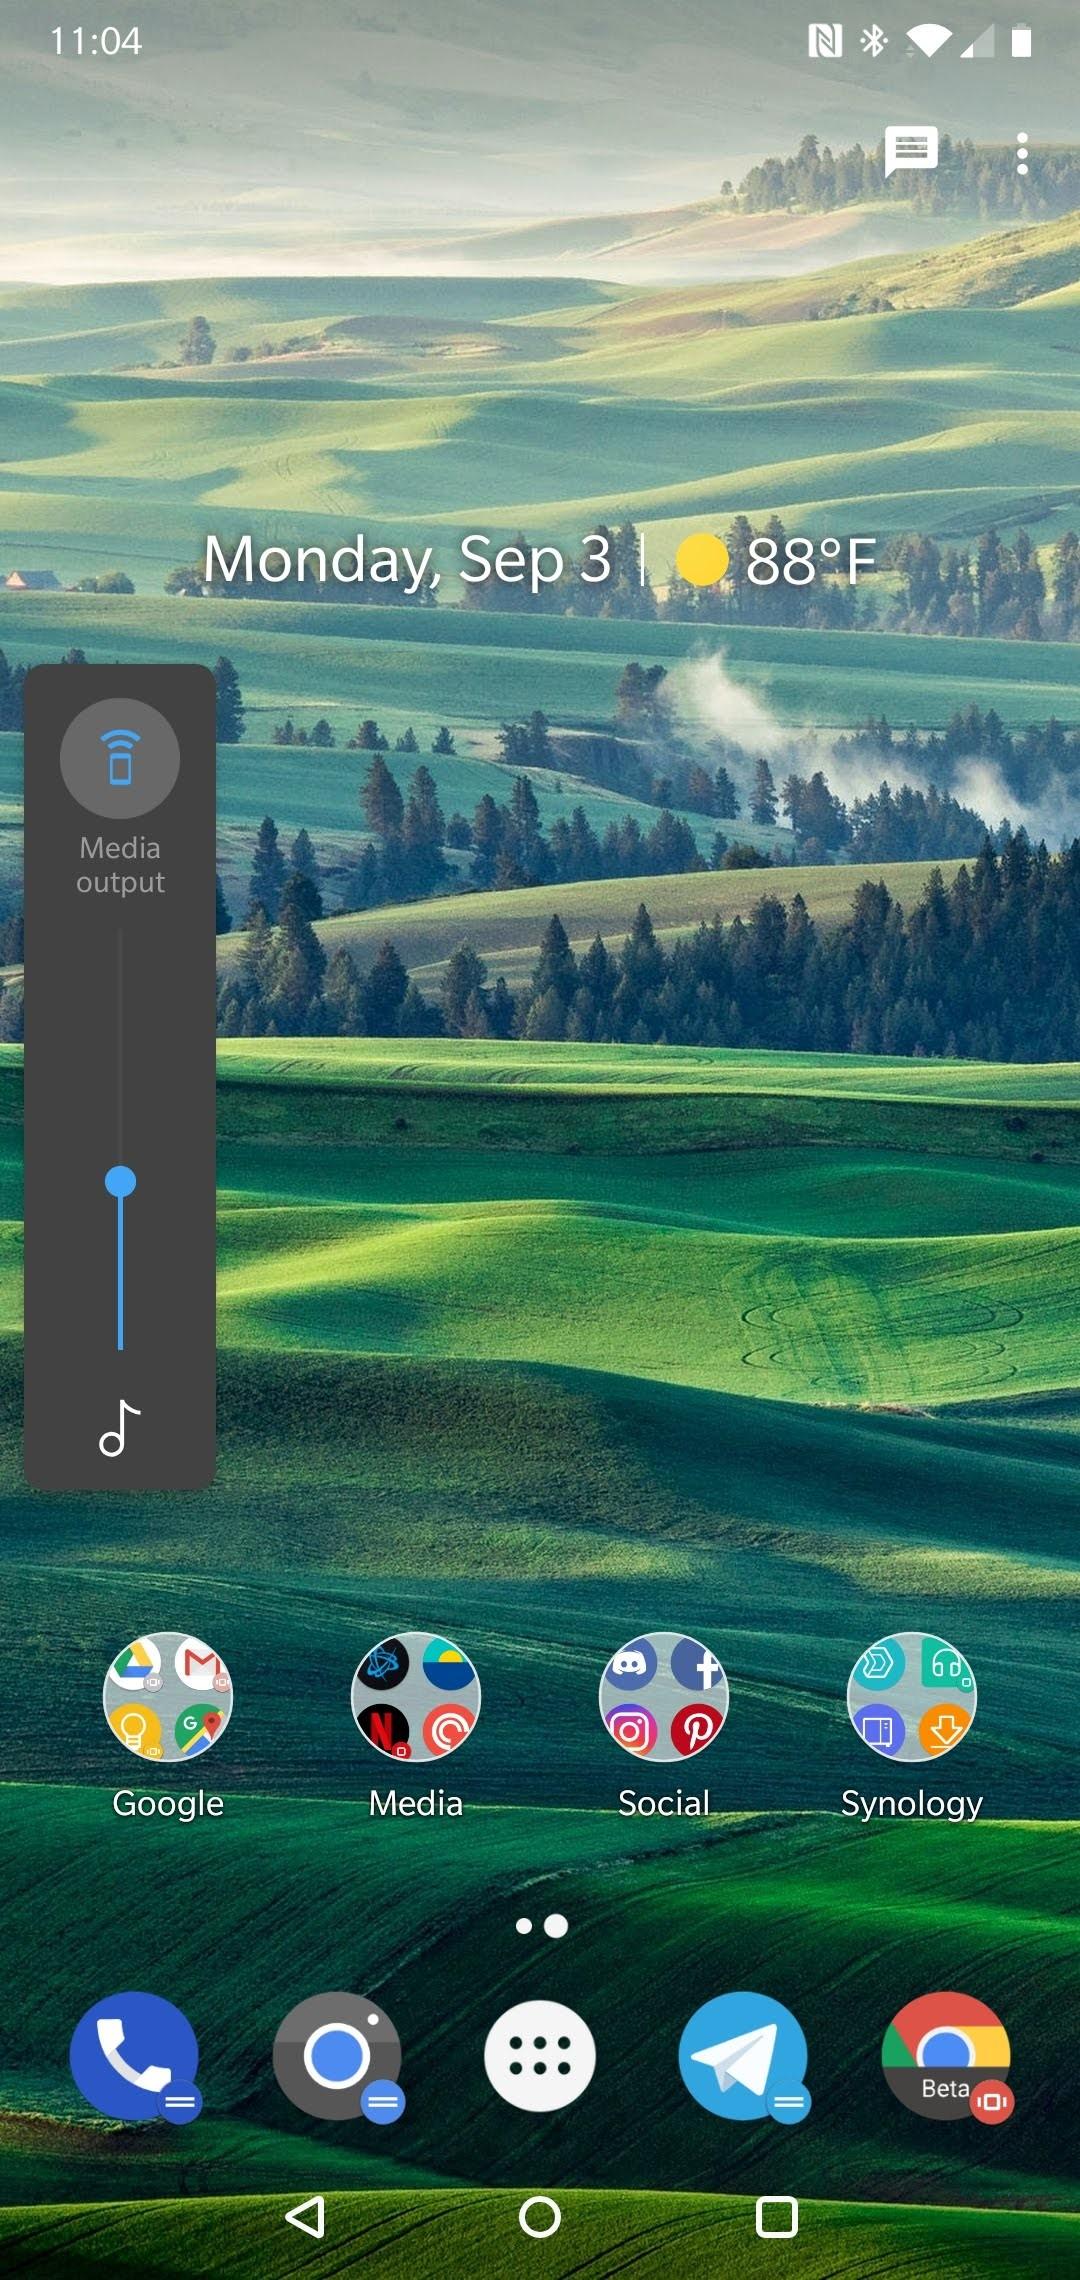 Вышла первая бета-сборка OxygenOS на основе Android P для OnePlus 63